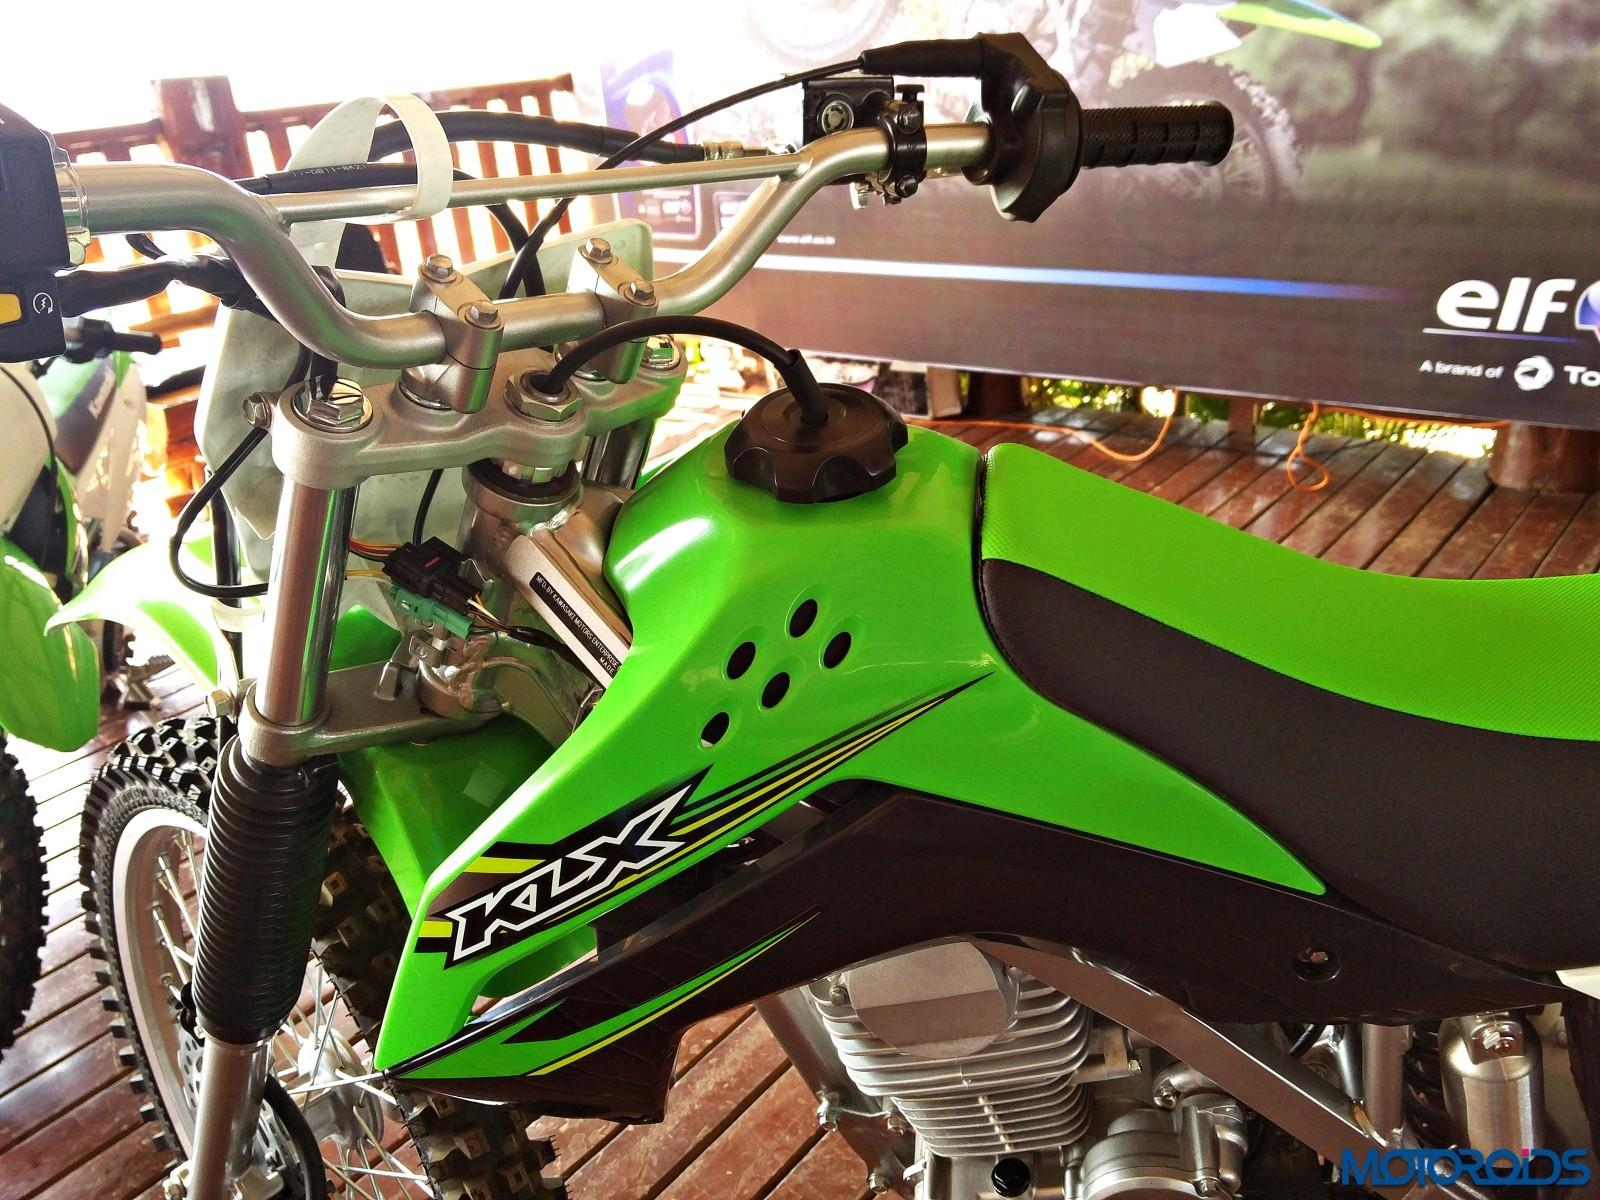 Kawasaki-KLX140G-Ride-Experience-6